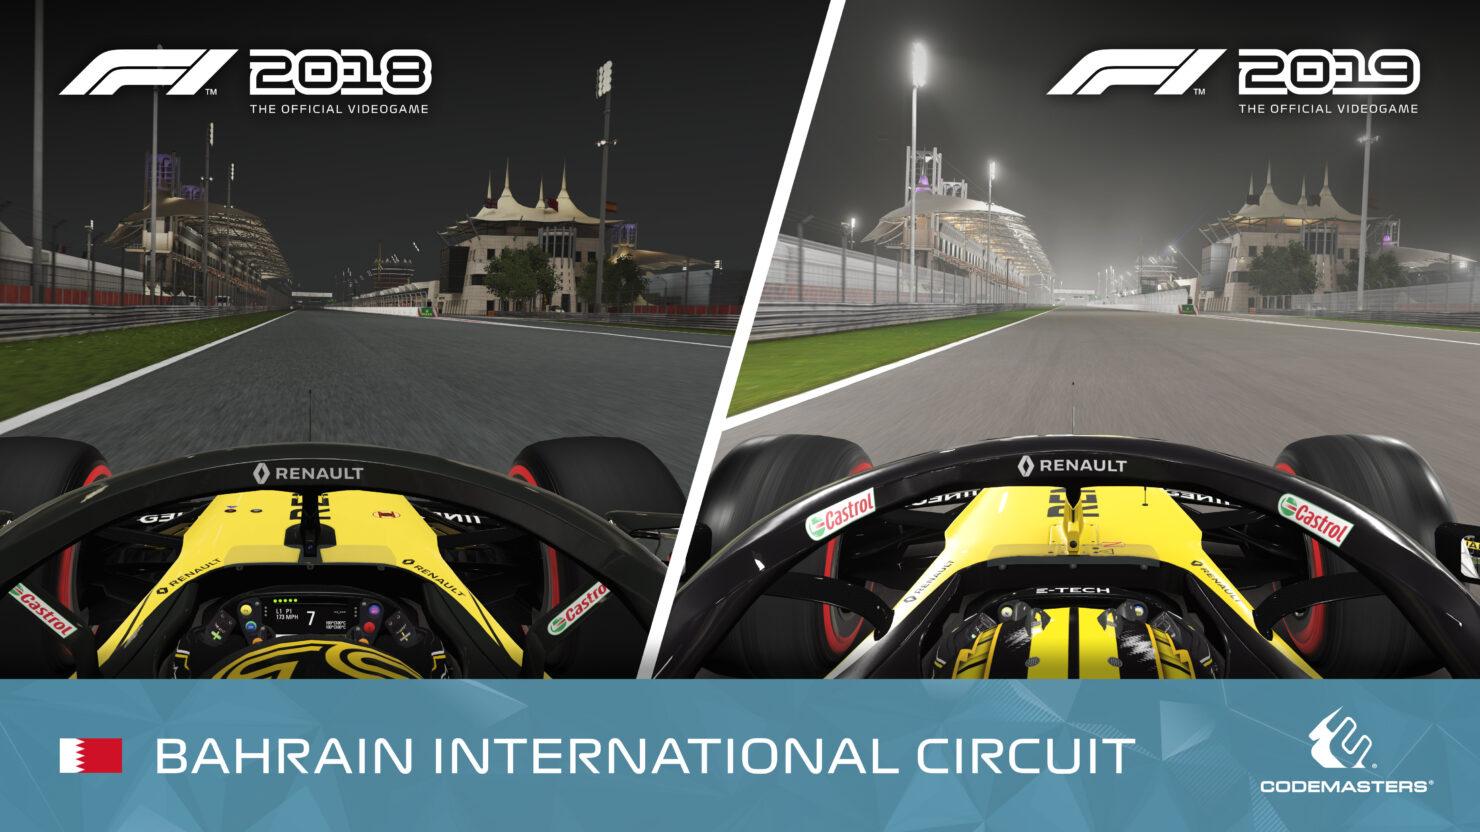 f1-2019-night-lighting-comparison-04-comparison-part-1